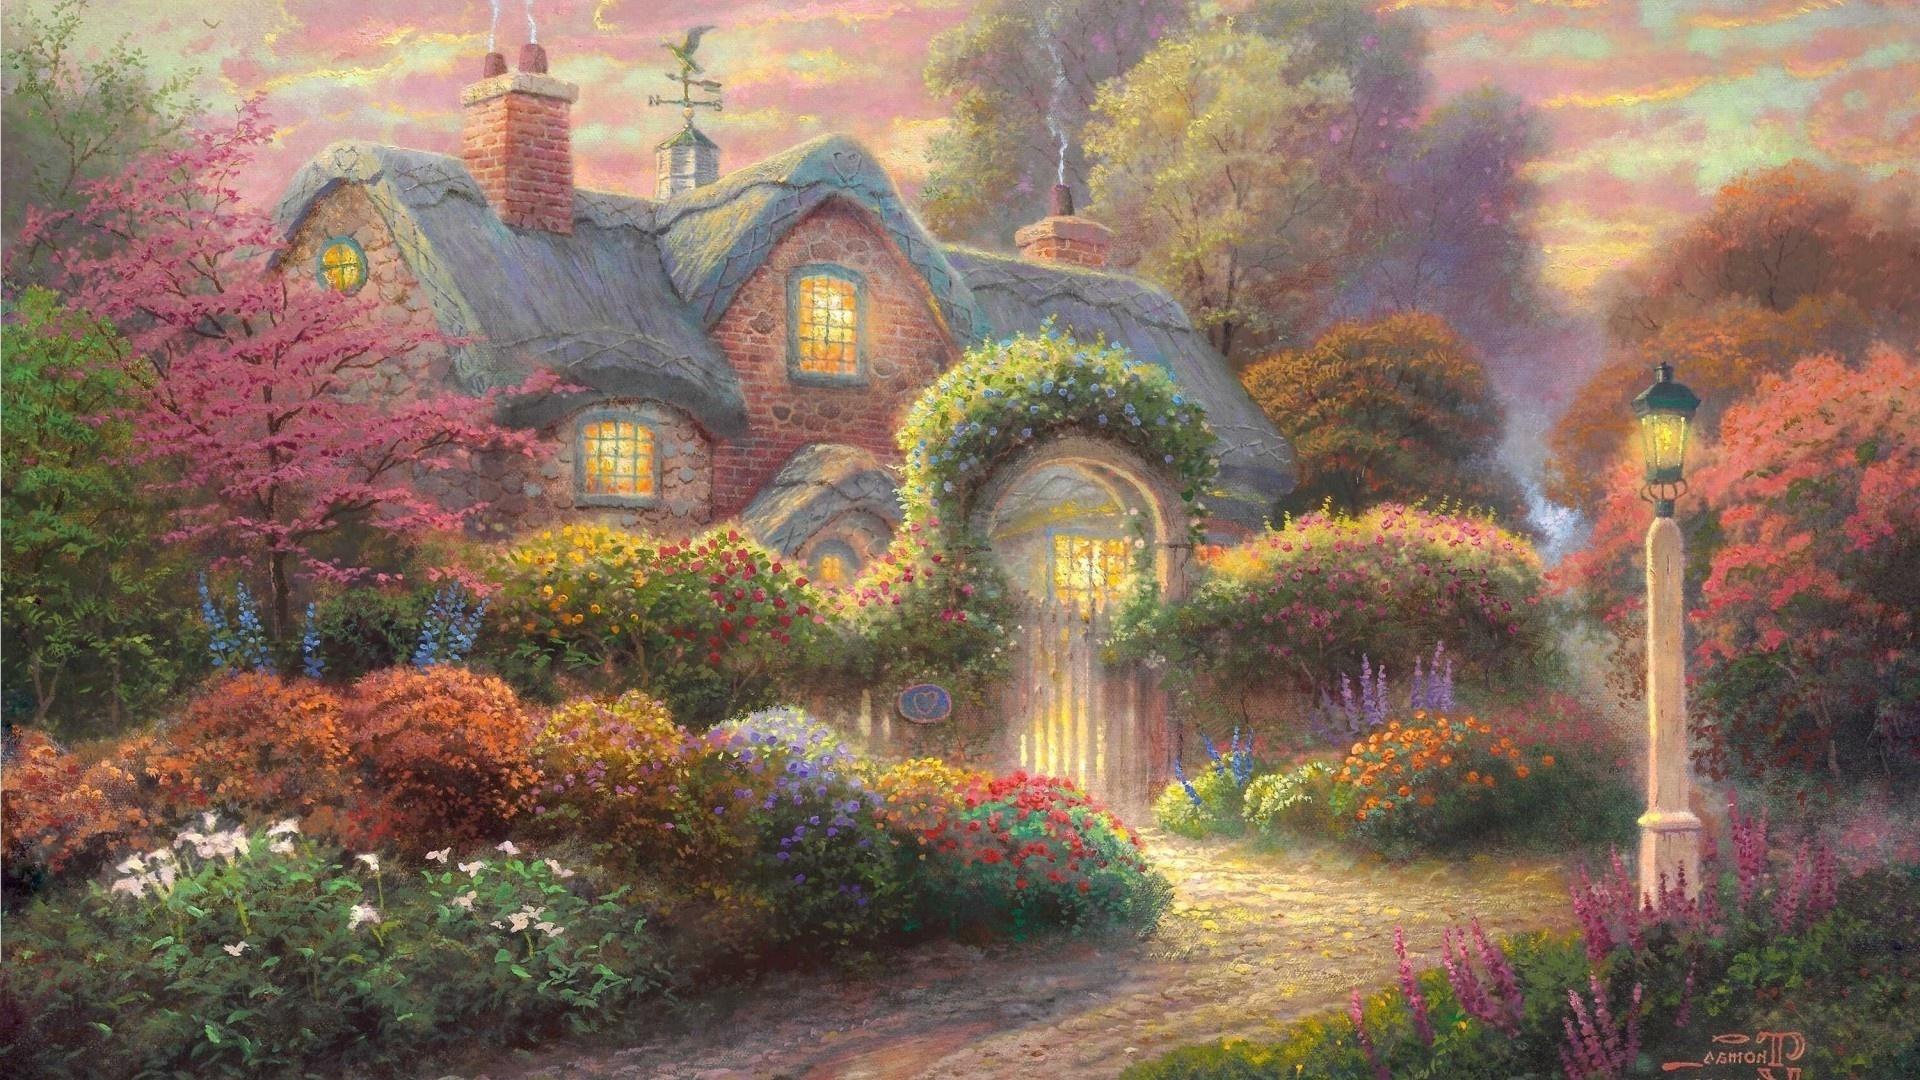 Garden Art Image